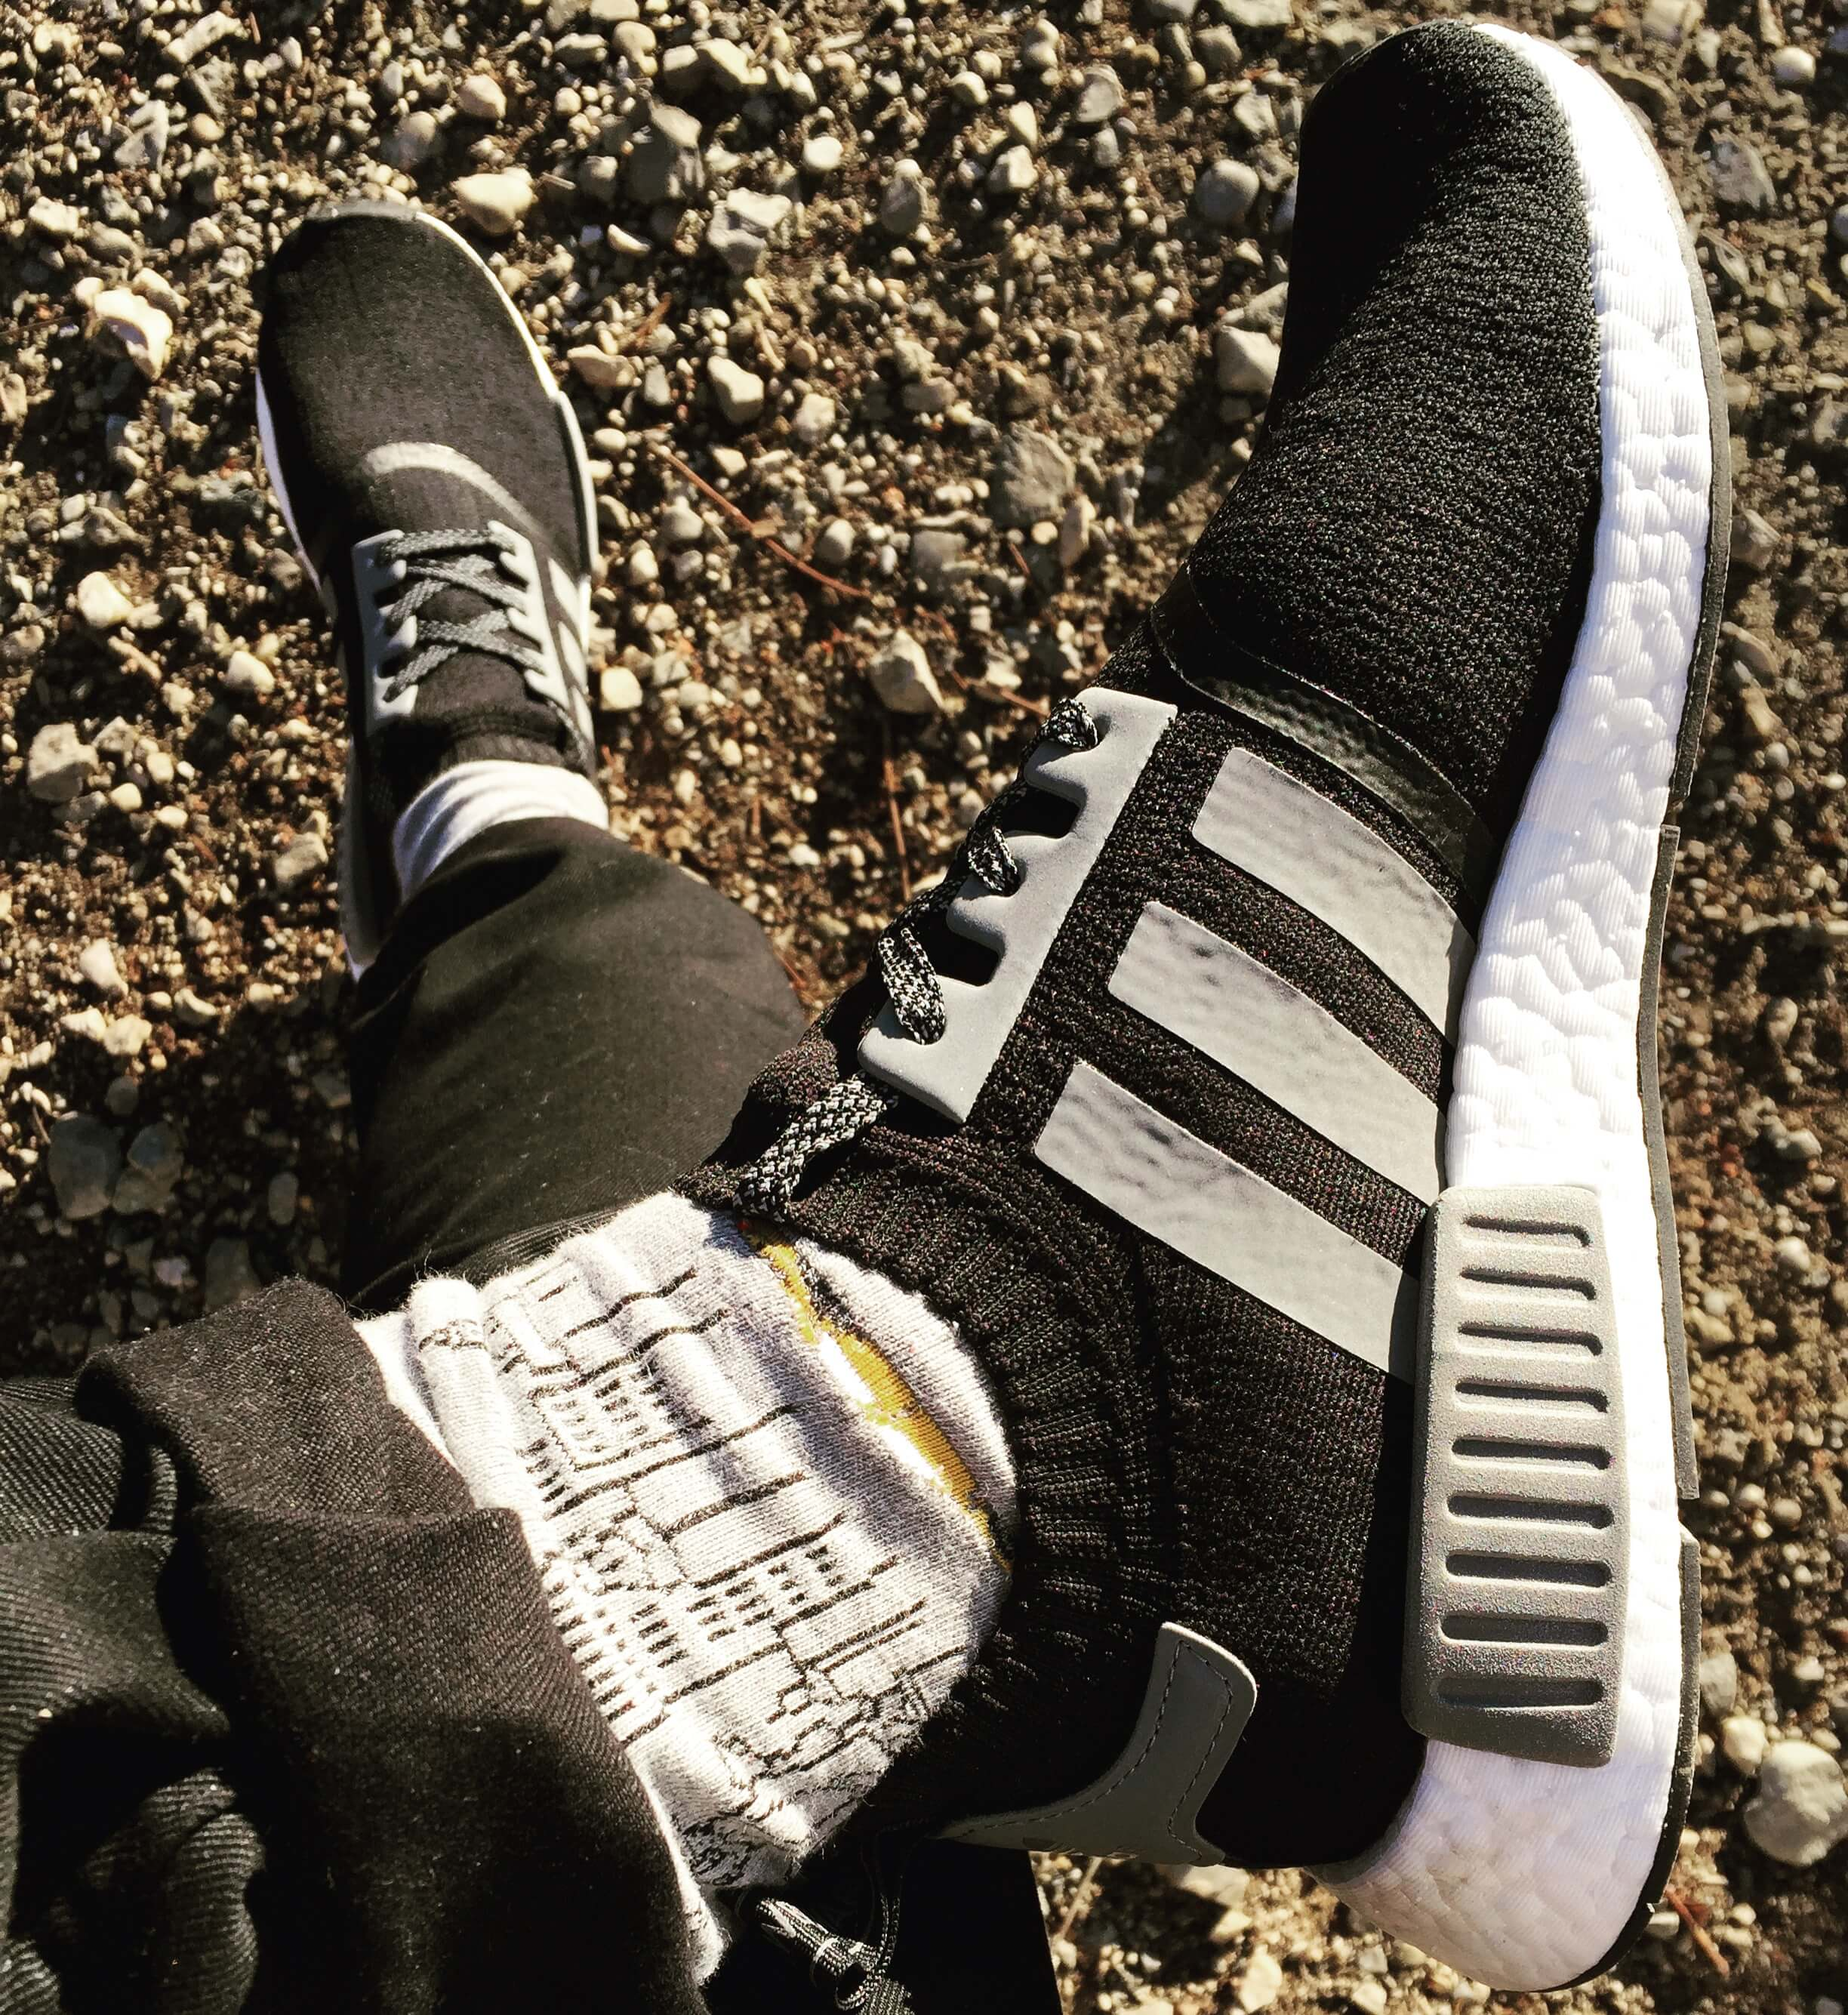 Adidas-NMD-Key-City-Activation-Top-View-Grey-Socks